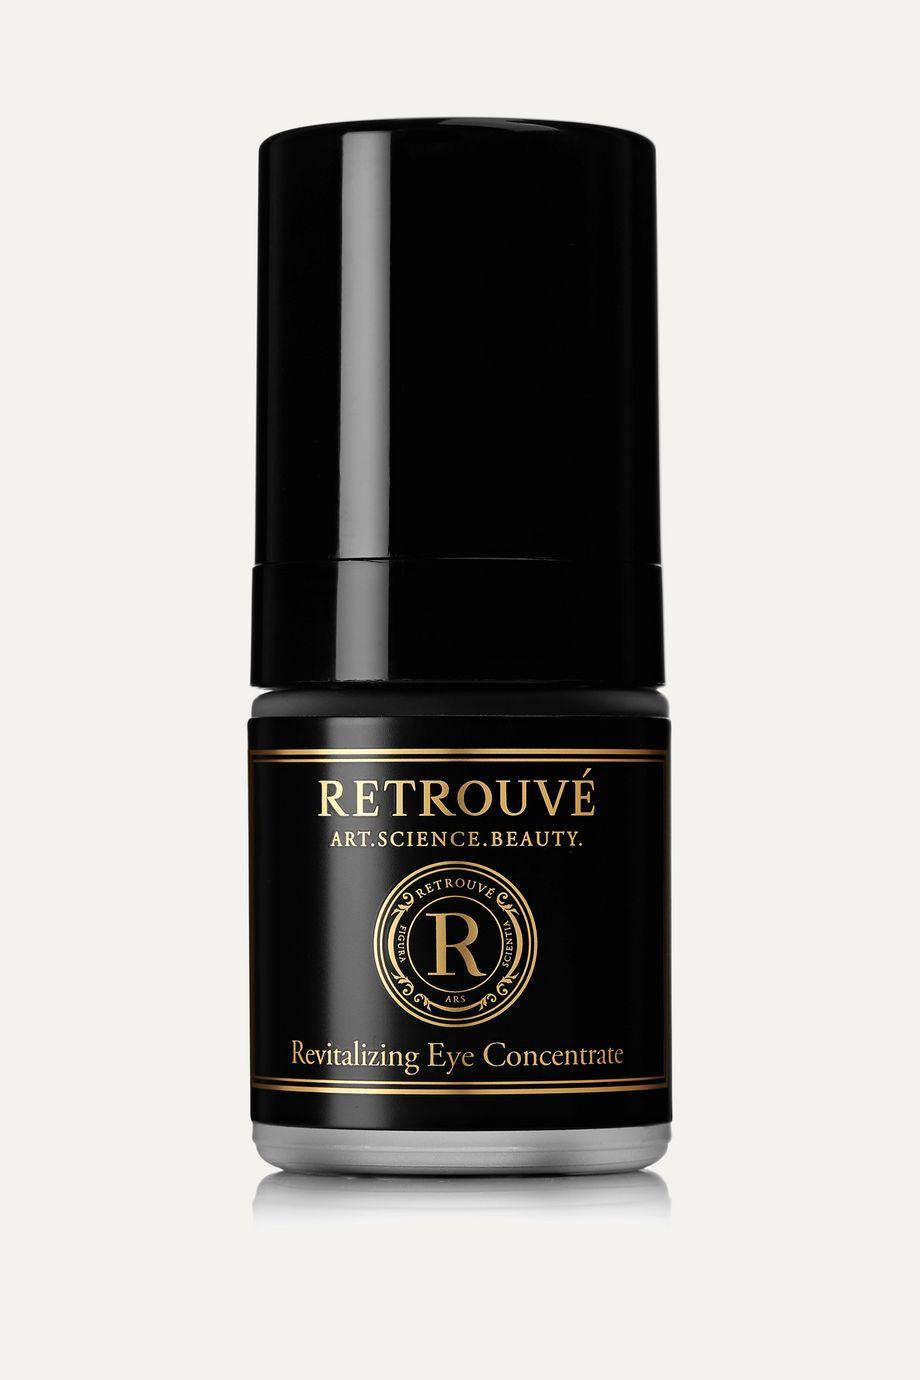 Retrouvé Revitalizing Eye Concentrate, 15ml